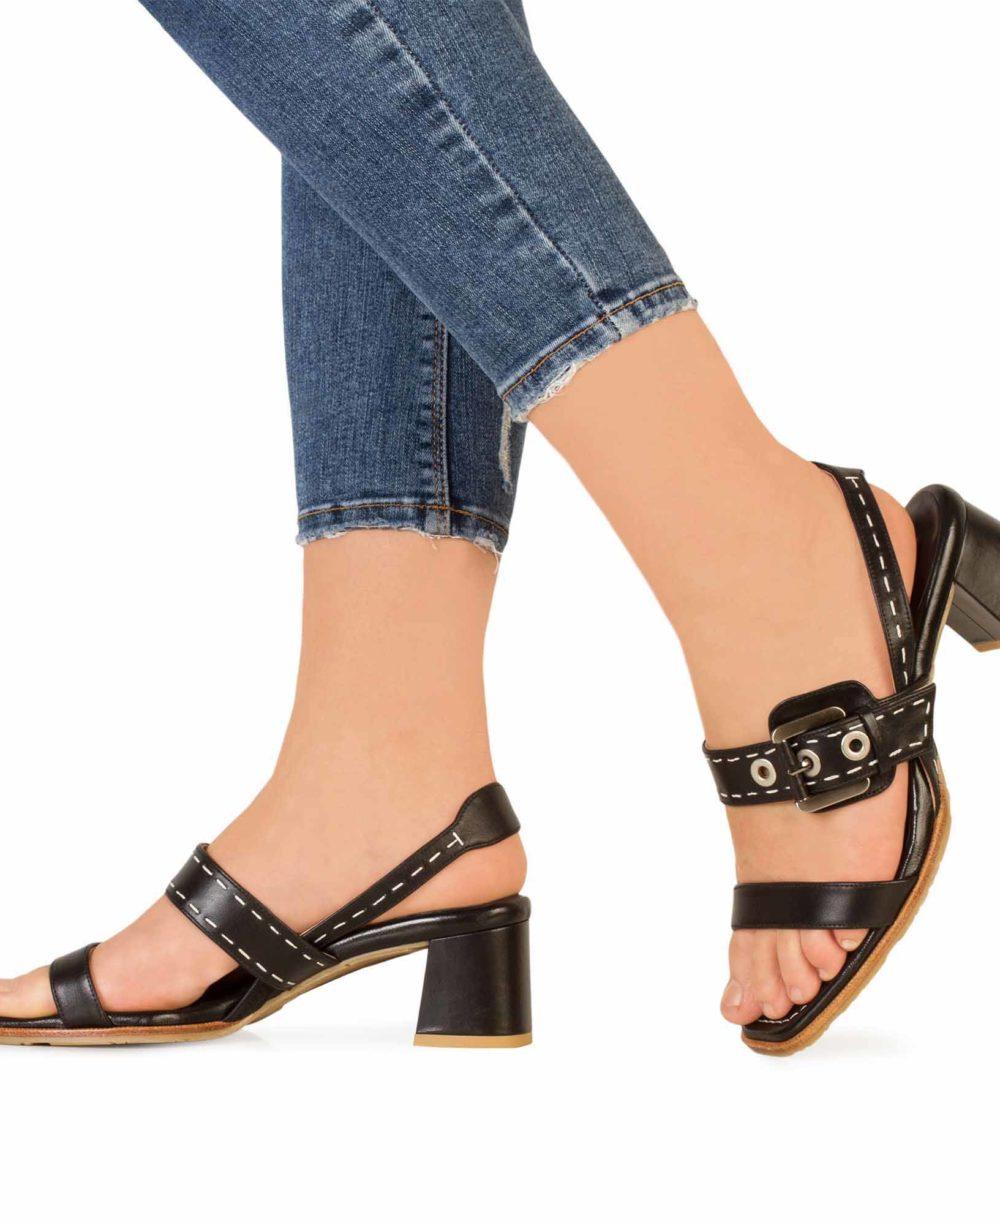 Sandalias de Piel Paco Gil - P3916 Black Madison Piernas